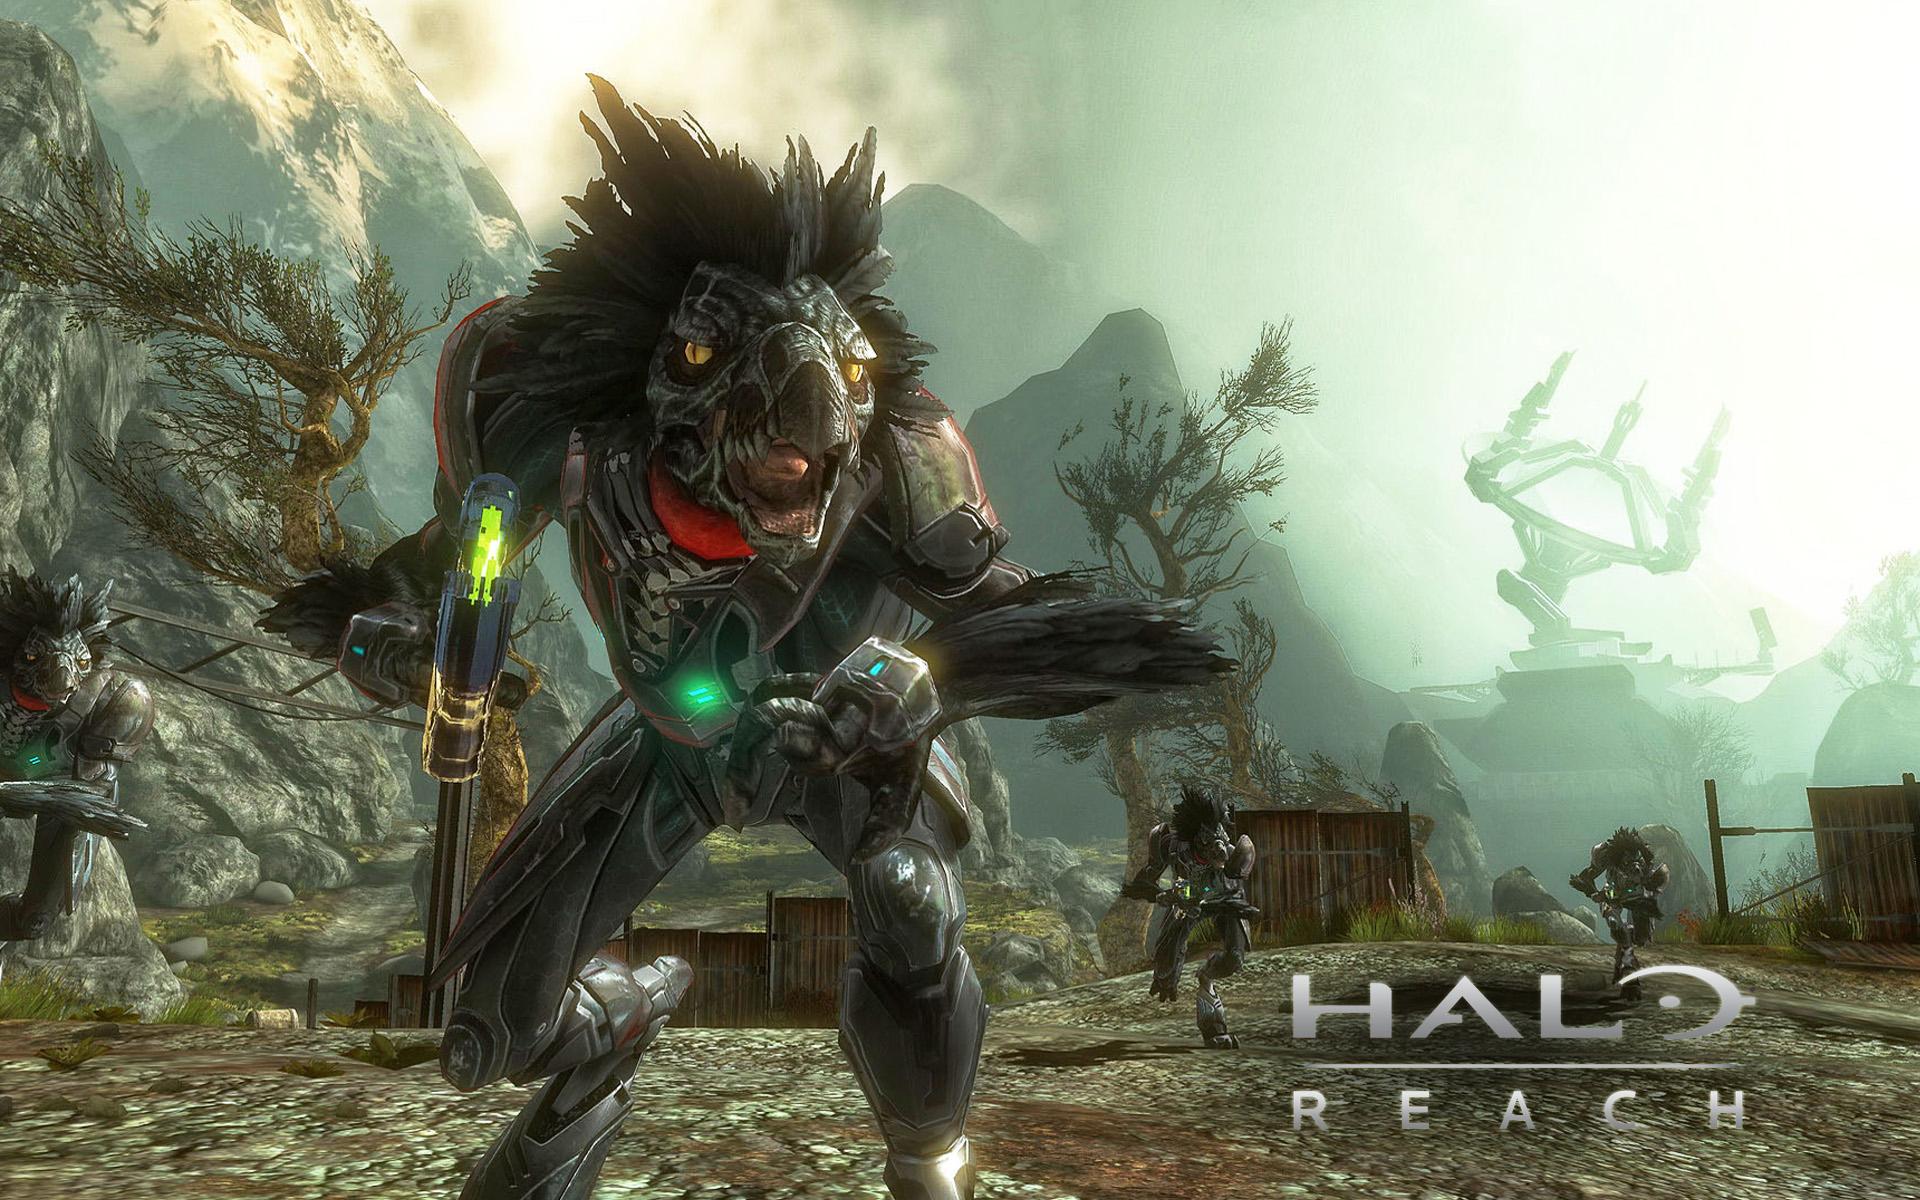 Halo Reach Wallpaper - QiGe87.com